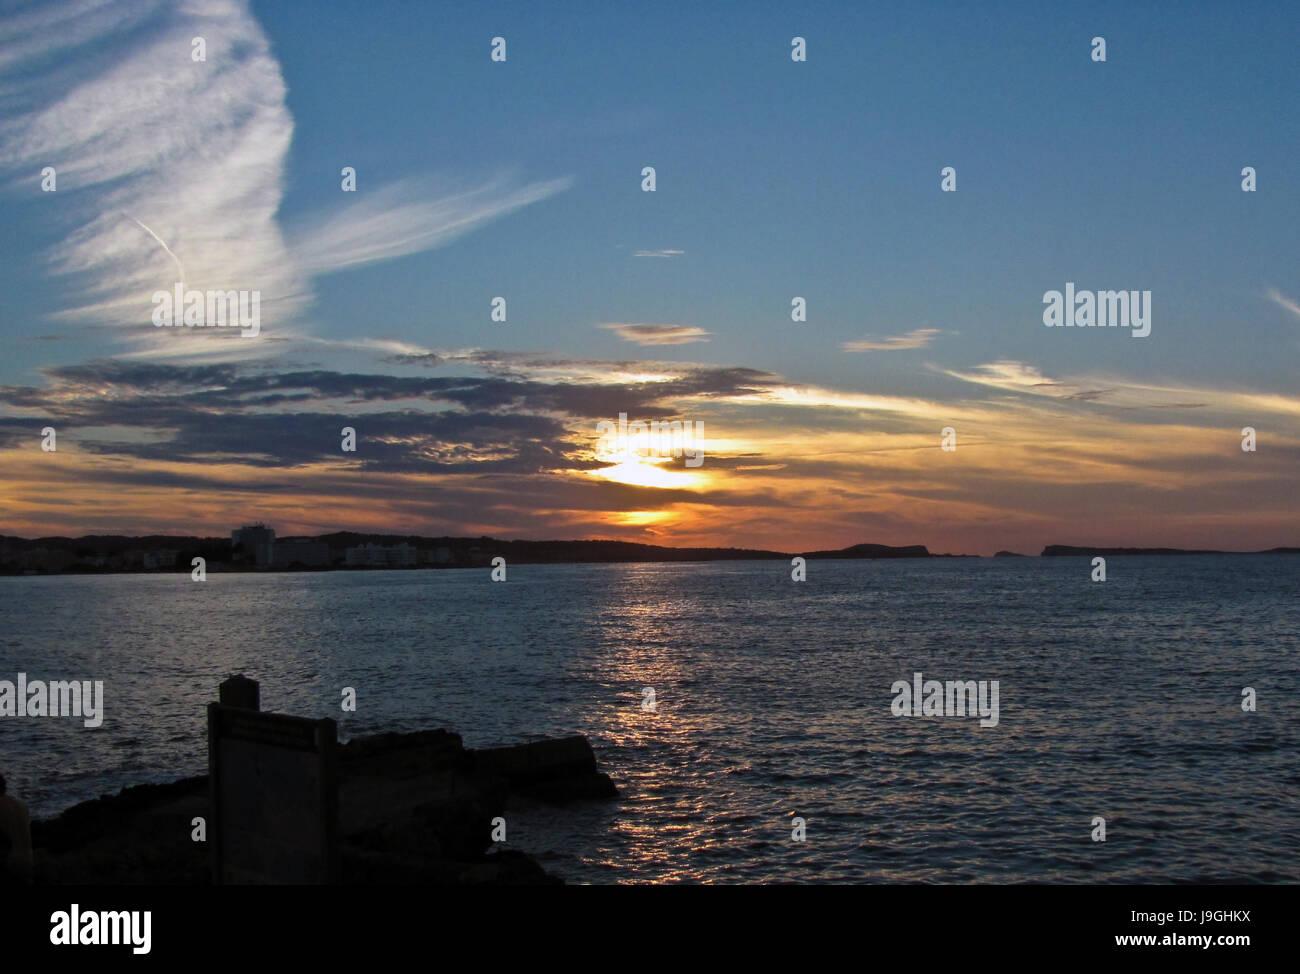 Sunsen in Ibiza - Stock Image